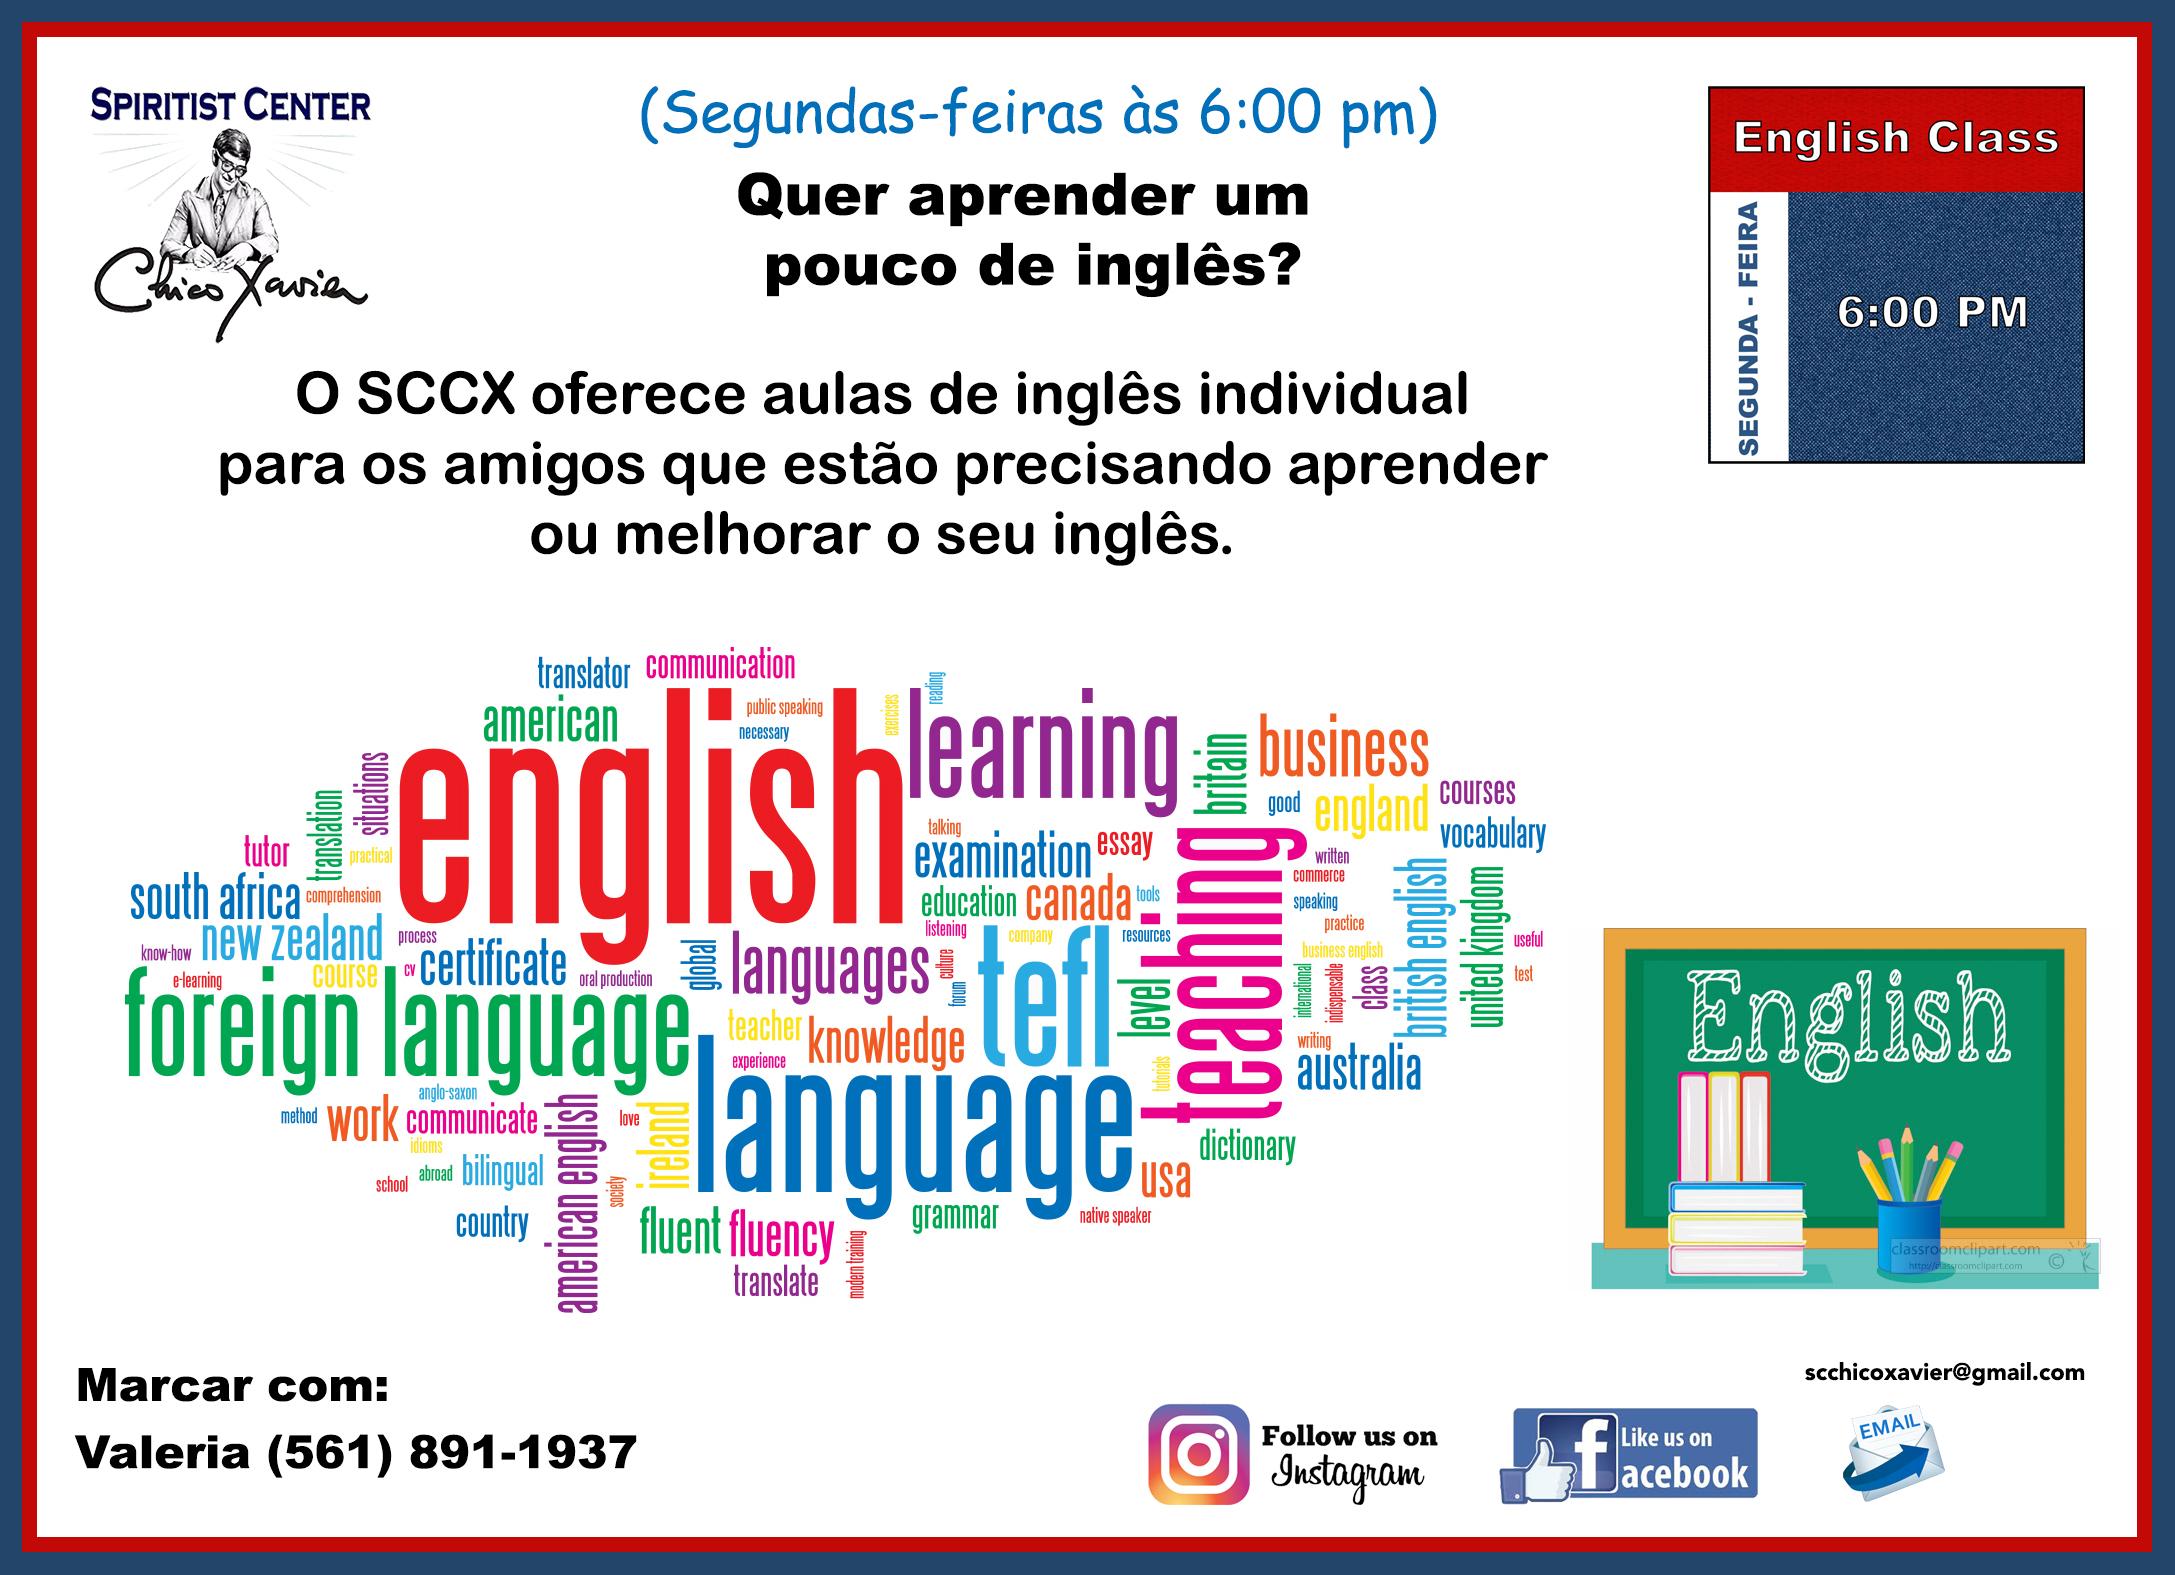 English Class individual